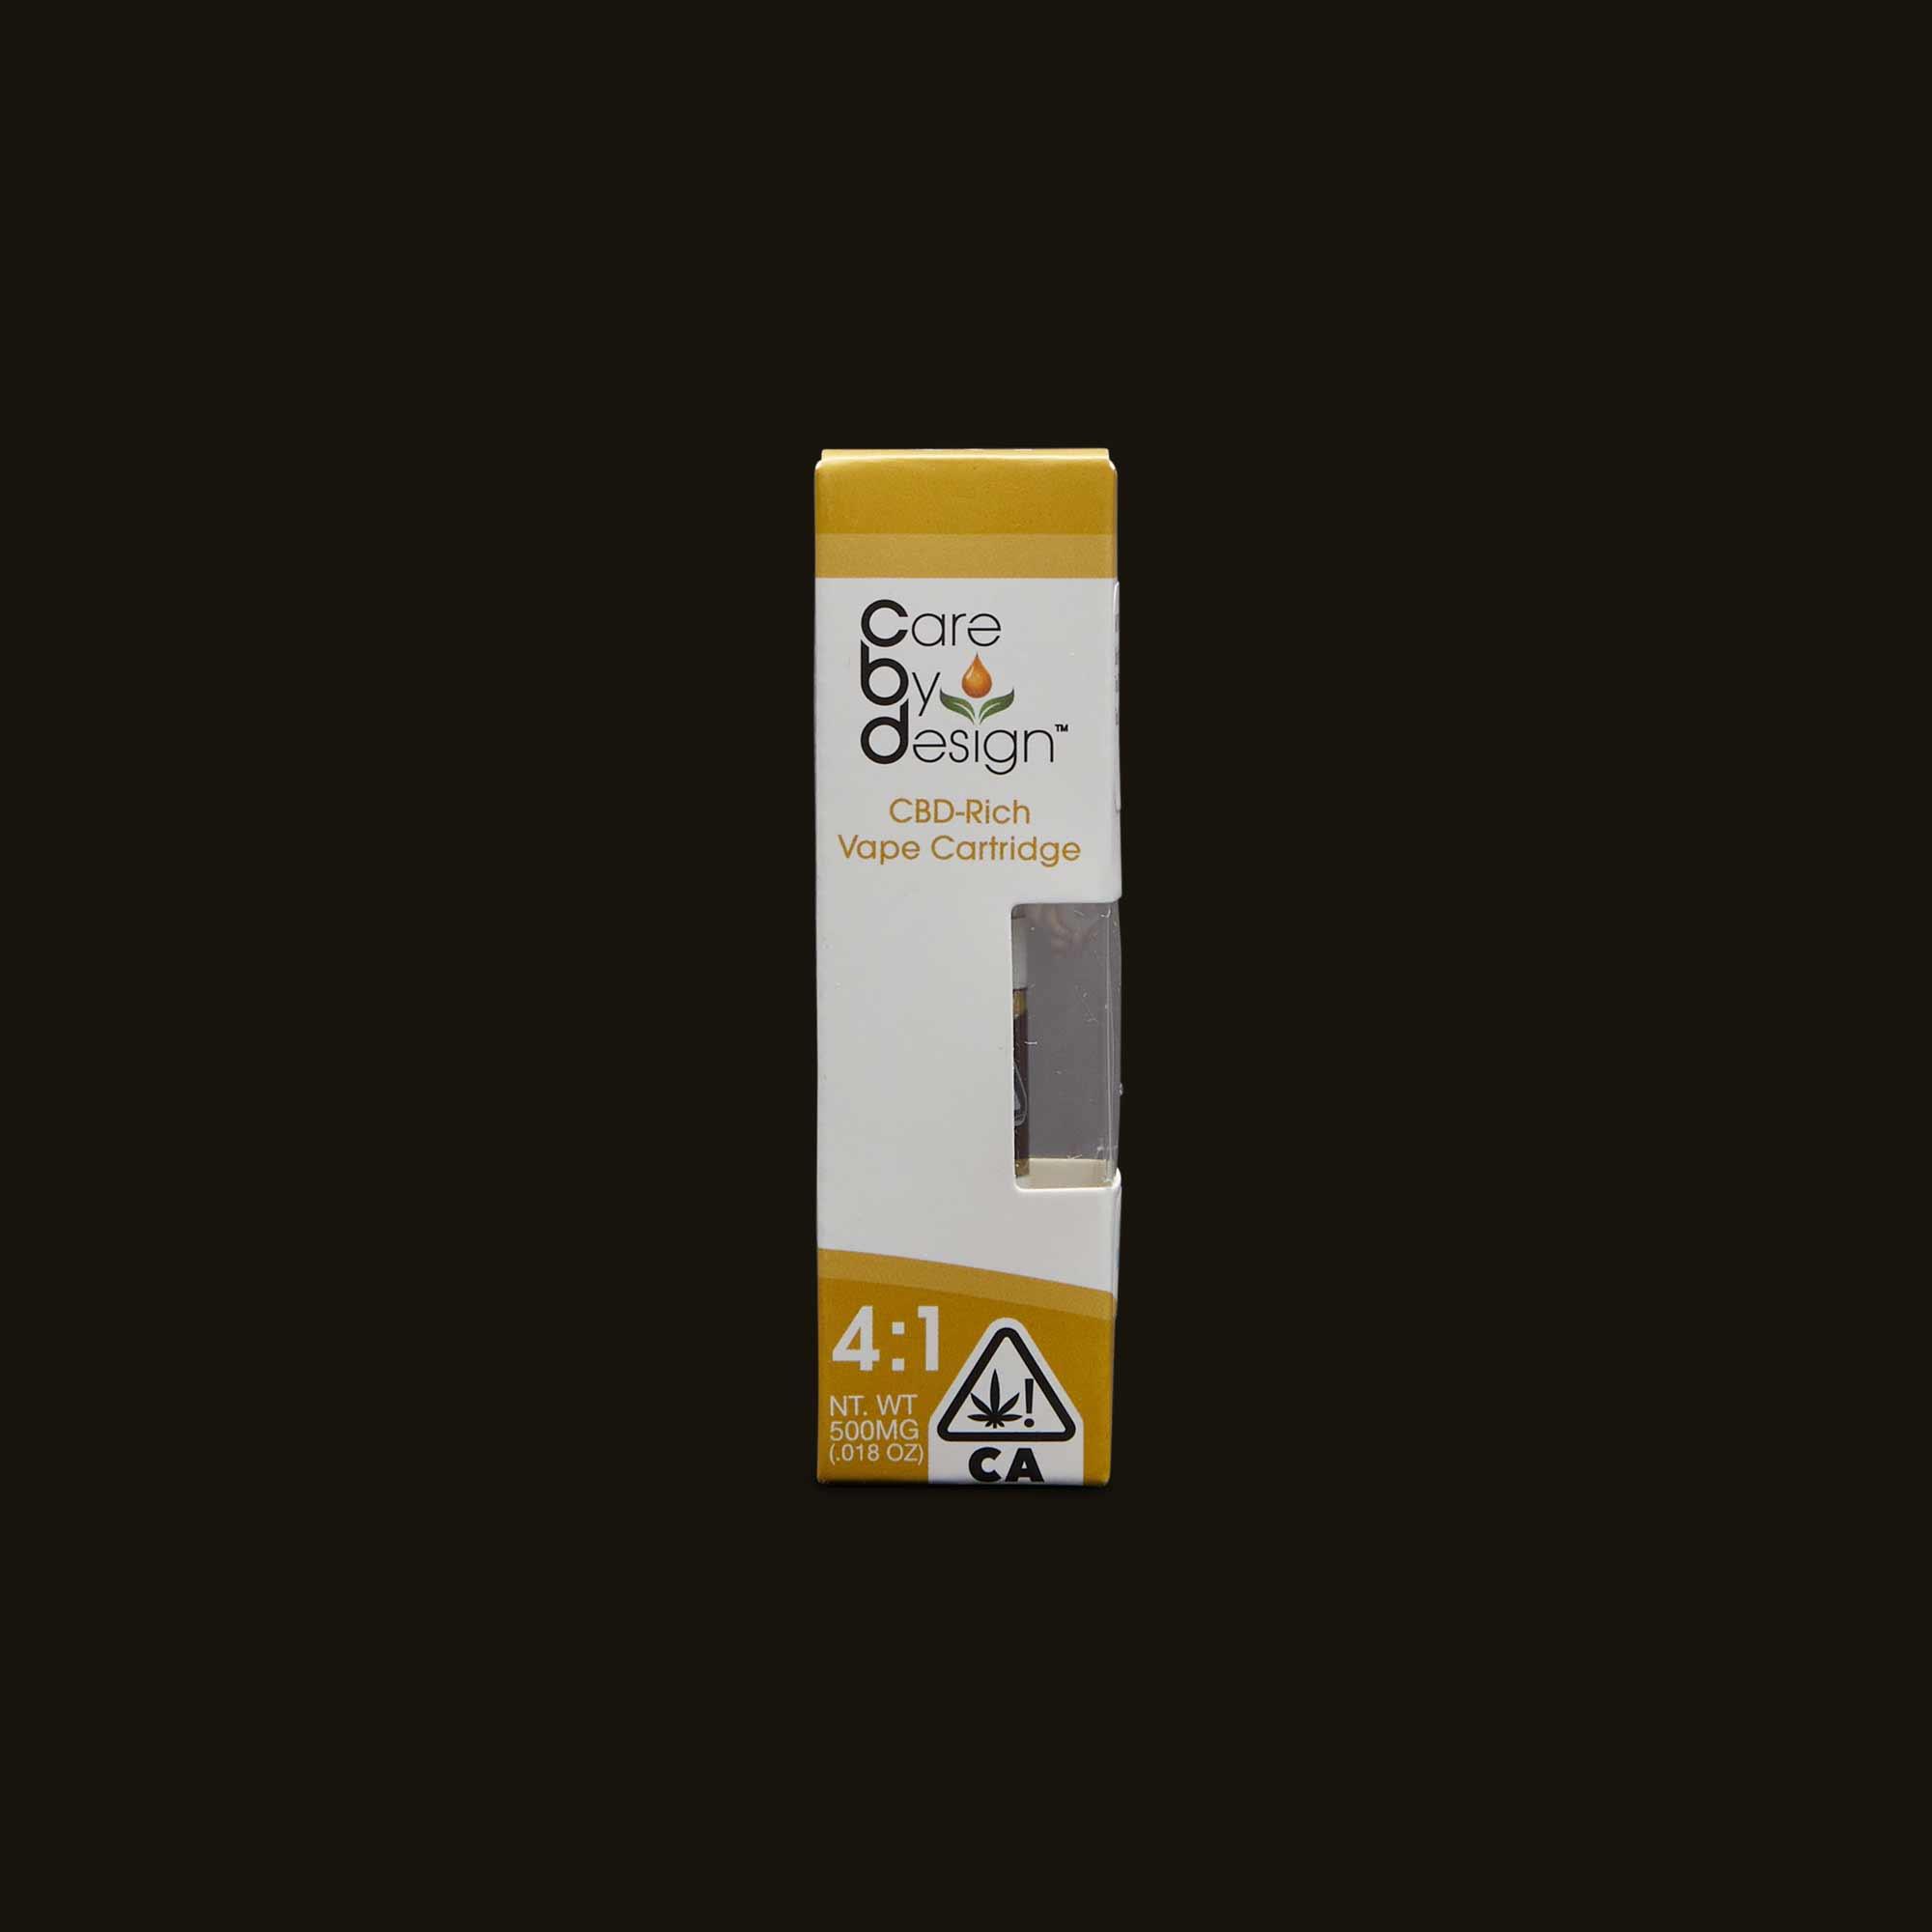 4:1 Vape Cartridge - 500mg cartridge